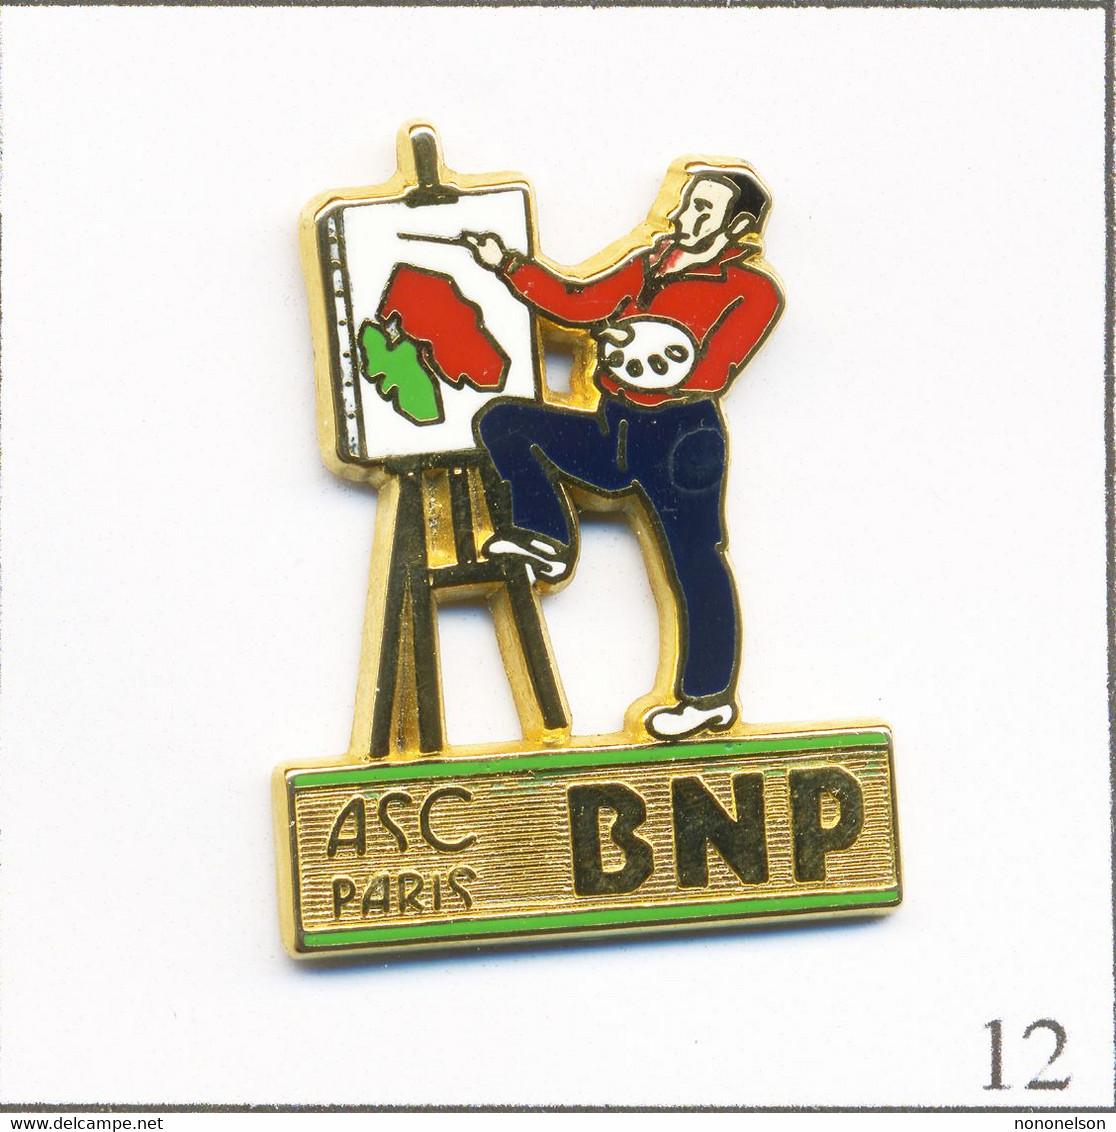 Pin's Banque / Assurance - BNP / ASC Paris - Peinture. Estampillé Ballard. Zamac. T738-12 - Banche